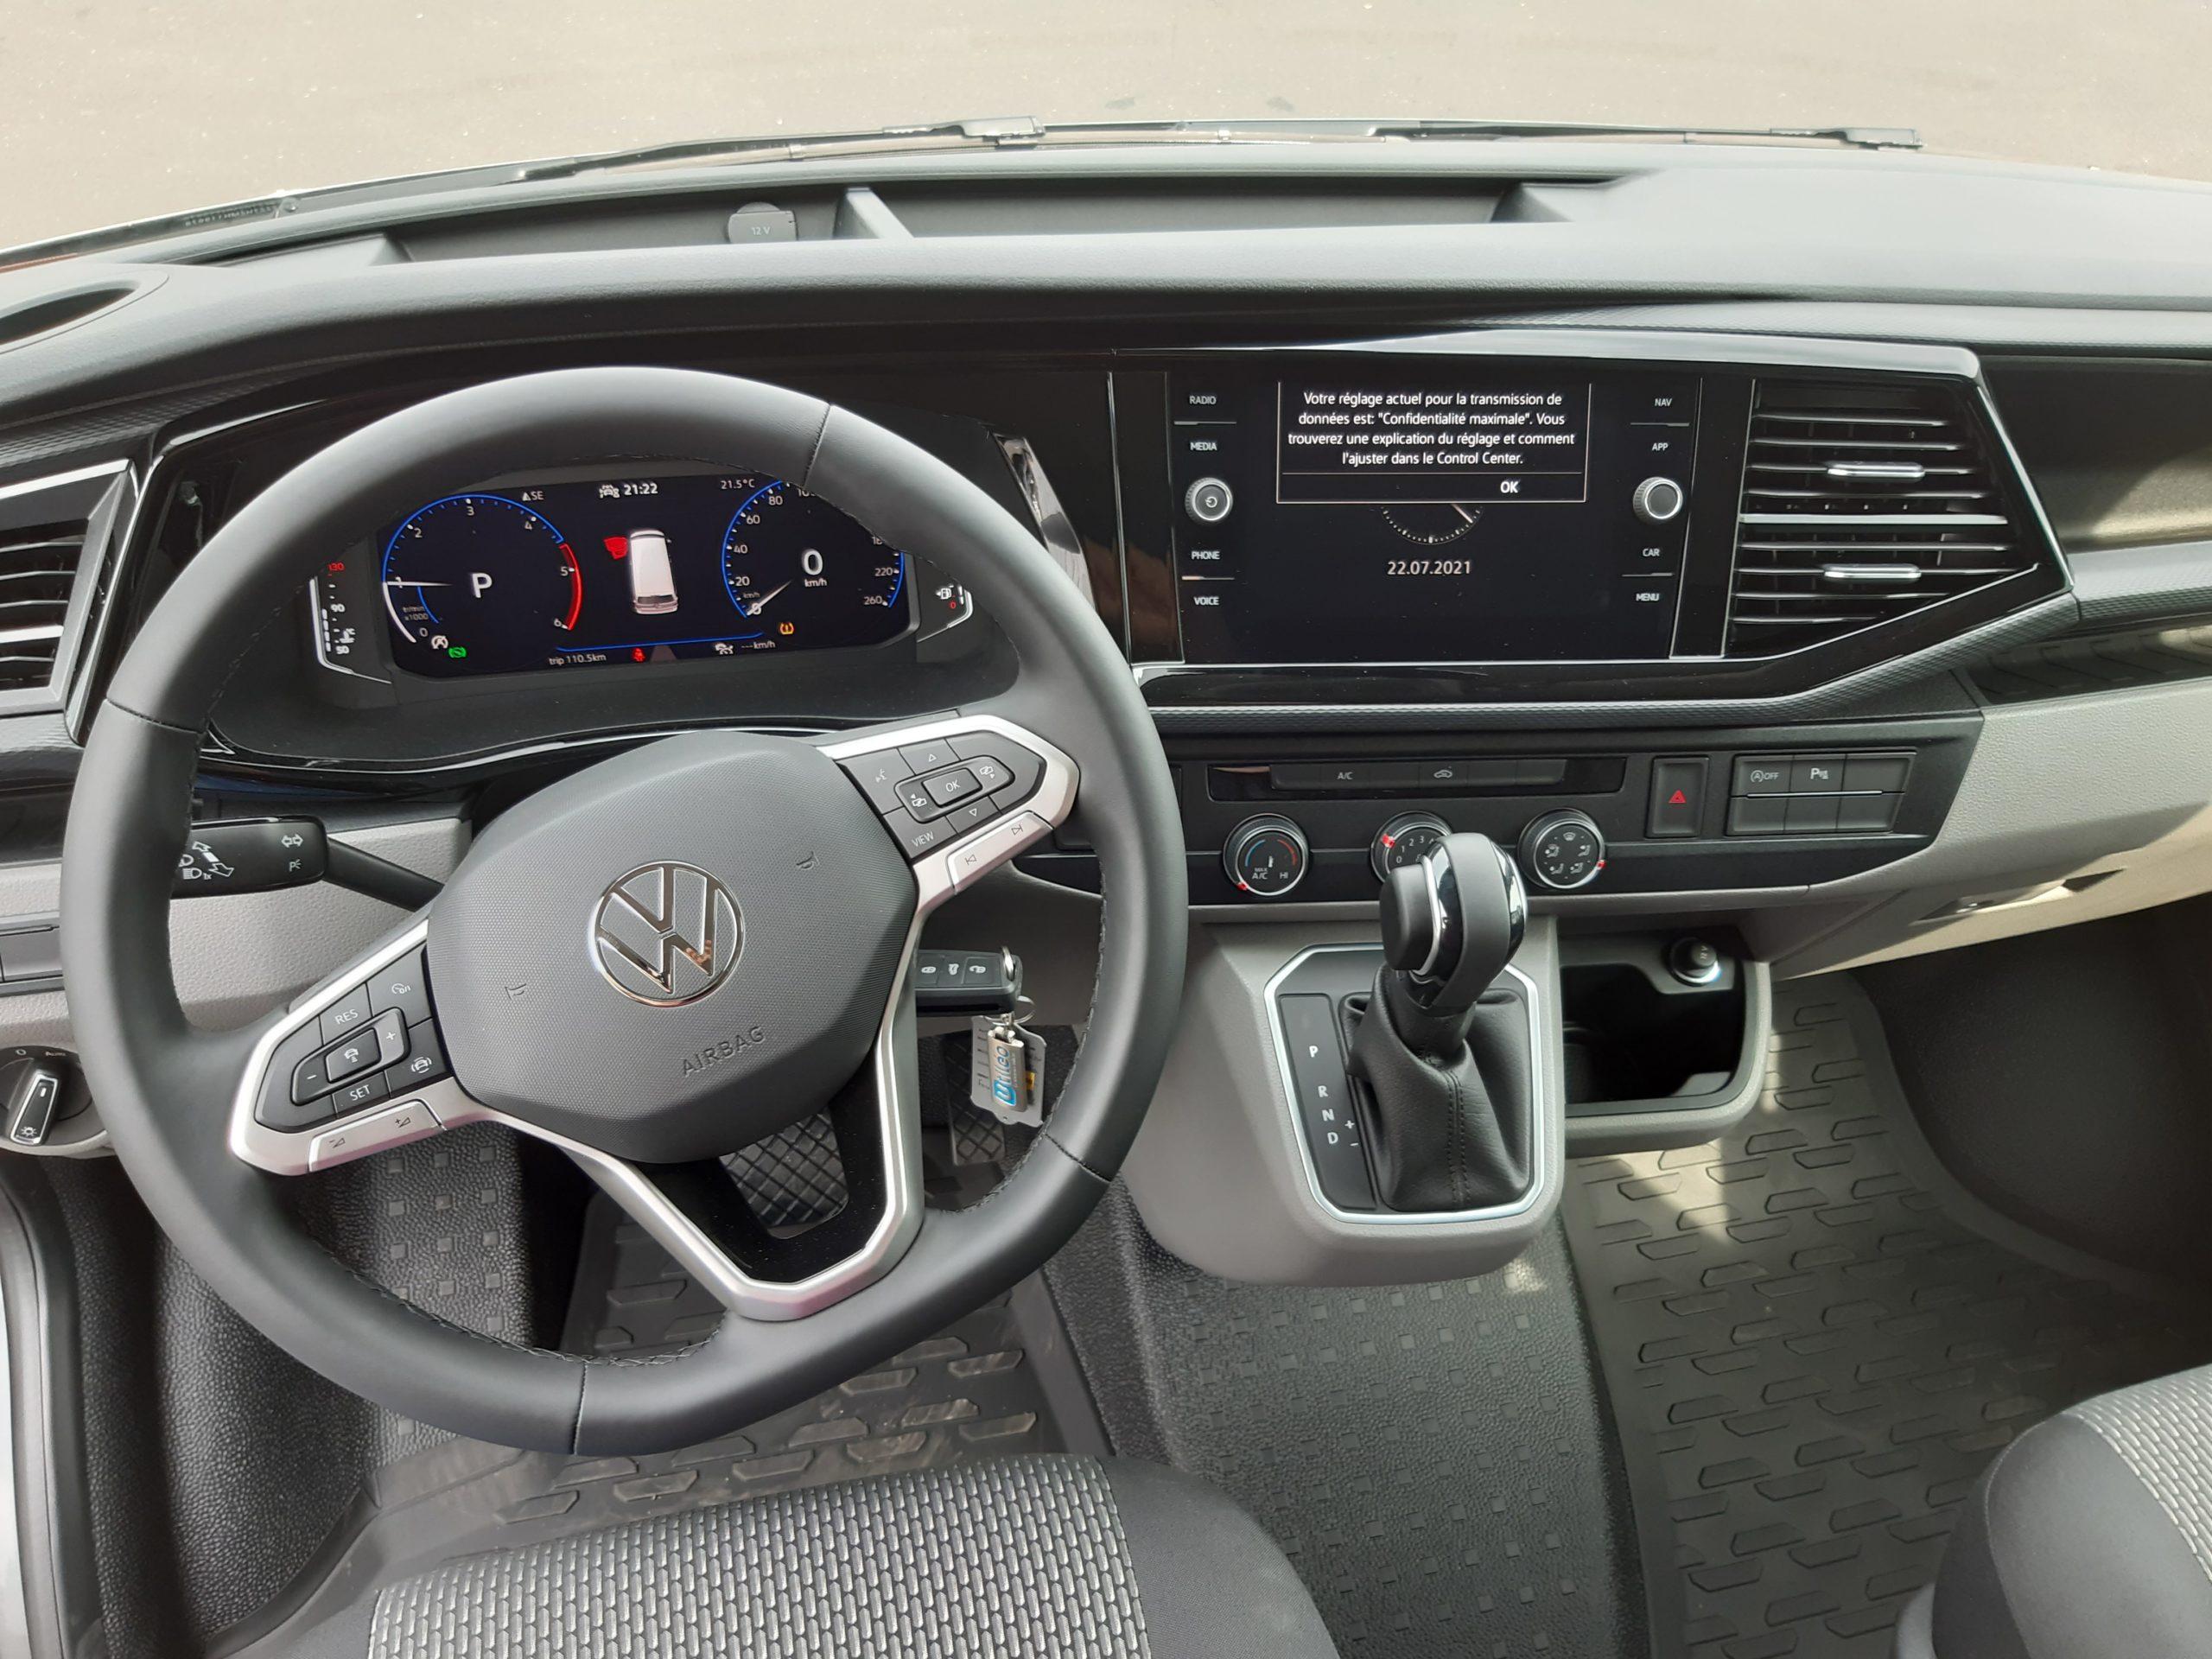 Location d'un fourgon compact double cabine - Volkswagen T6-1 Cabine APP - Vue8